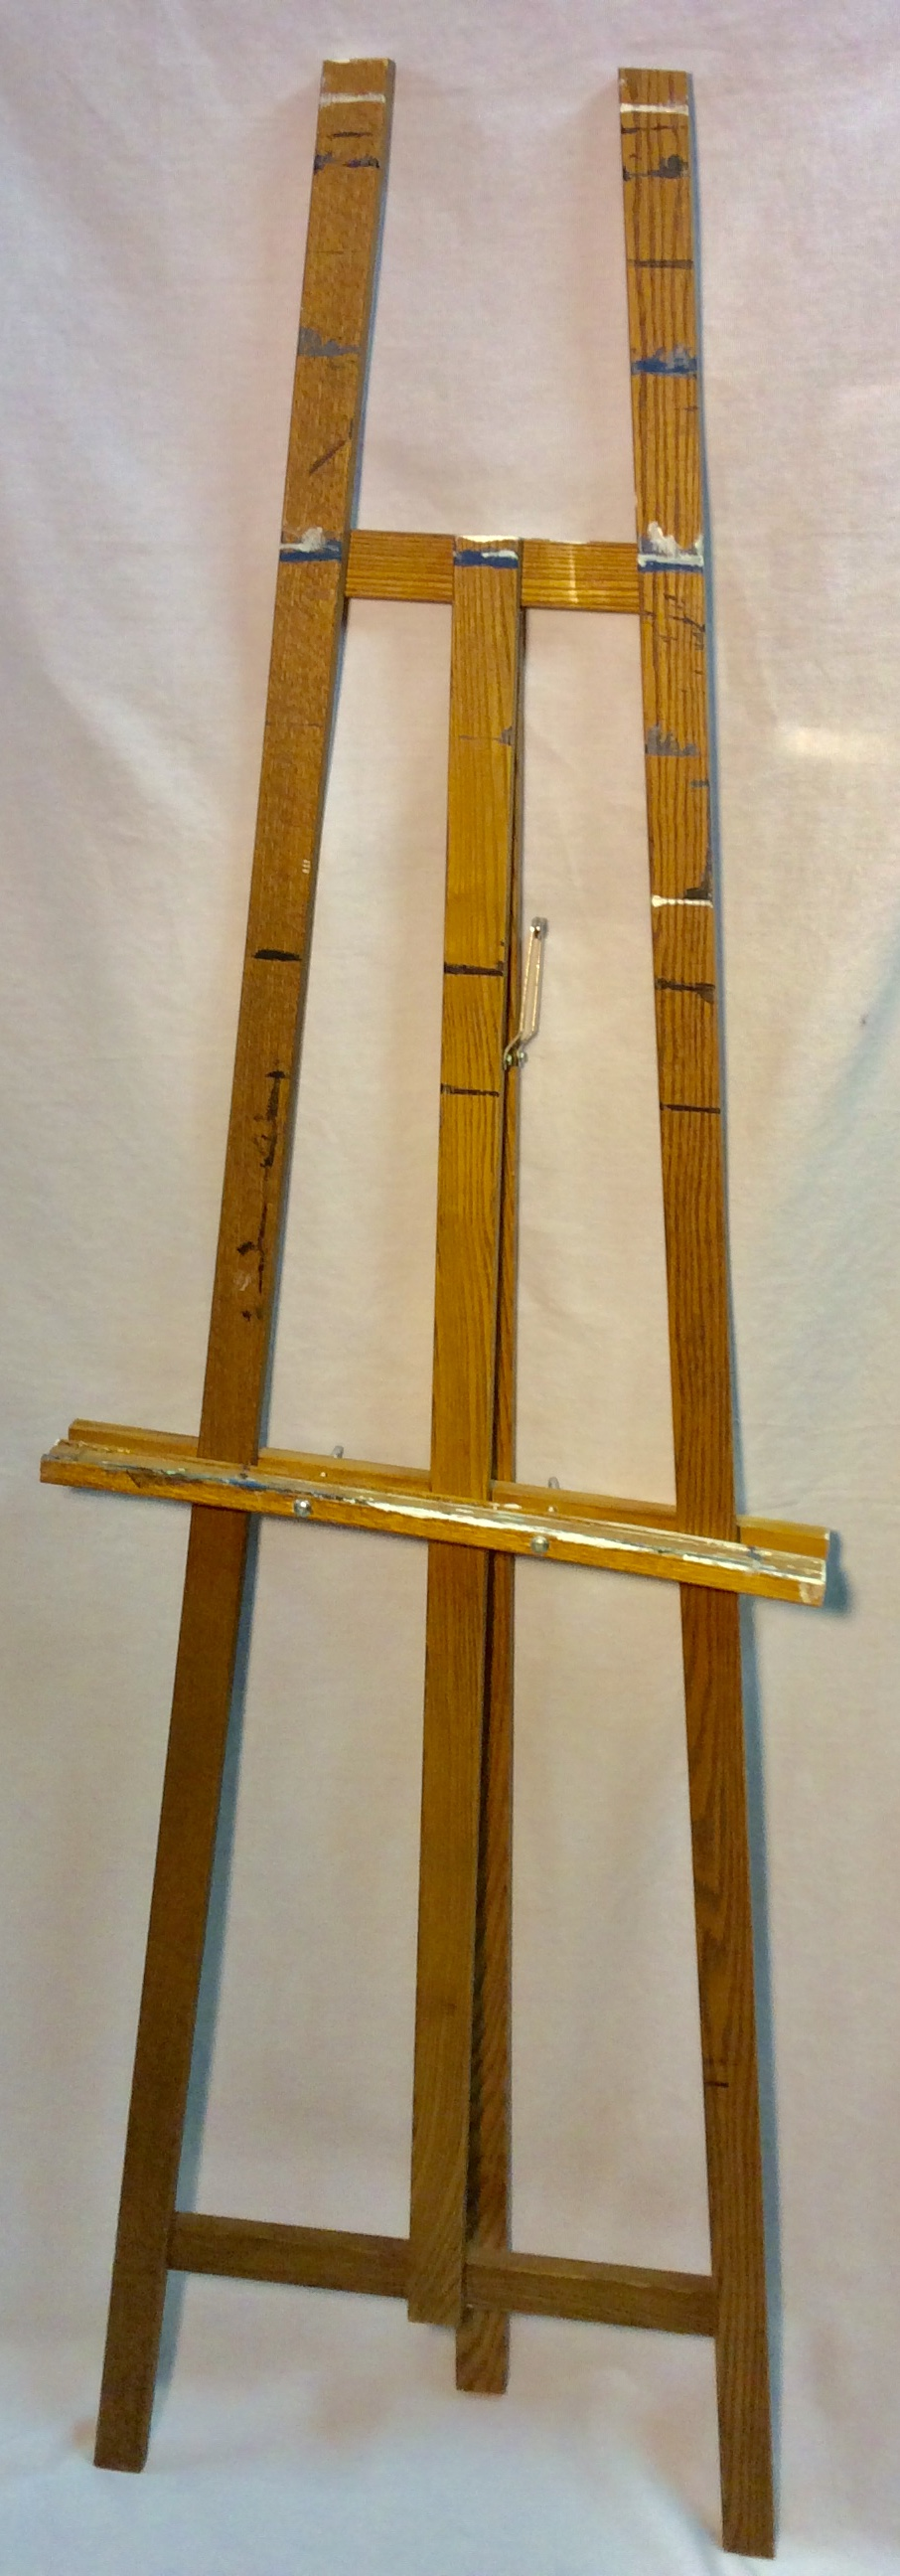 Wooden Art Easel, free-standing